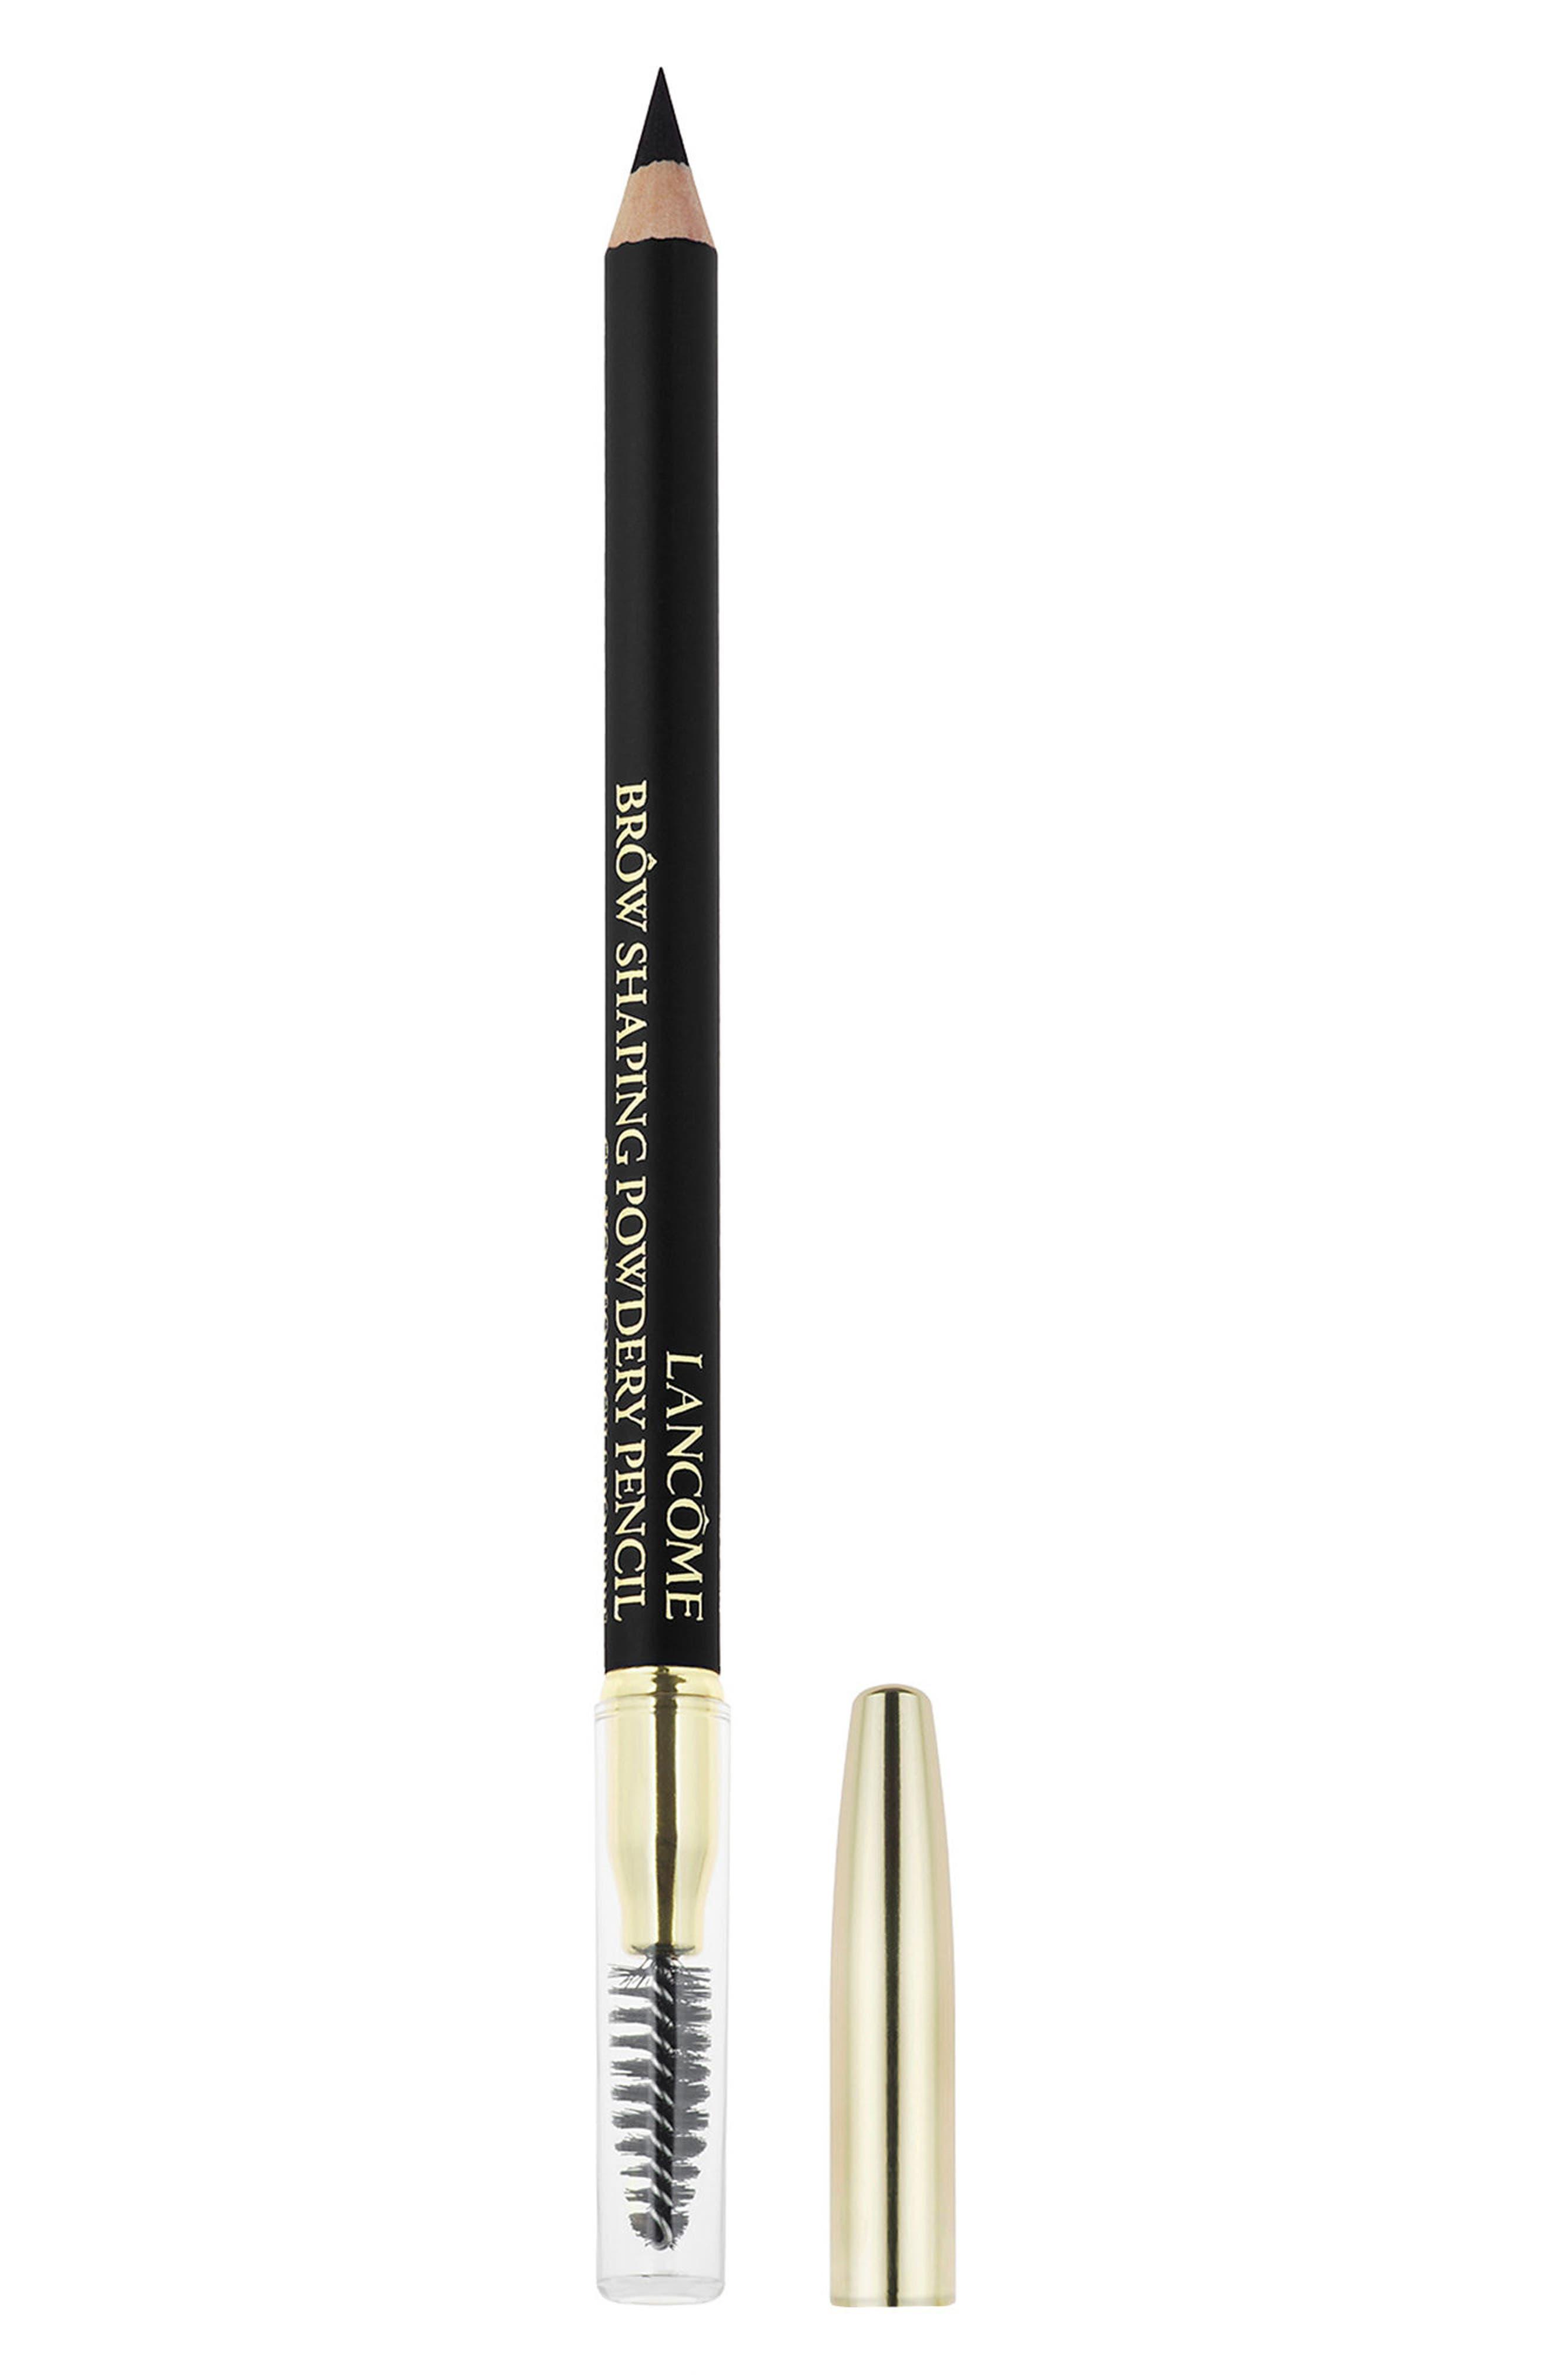 LANCÔME, Brow Shaping Powdery Pencil, Main thumbnail 1, color, BLACK 10